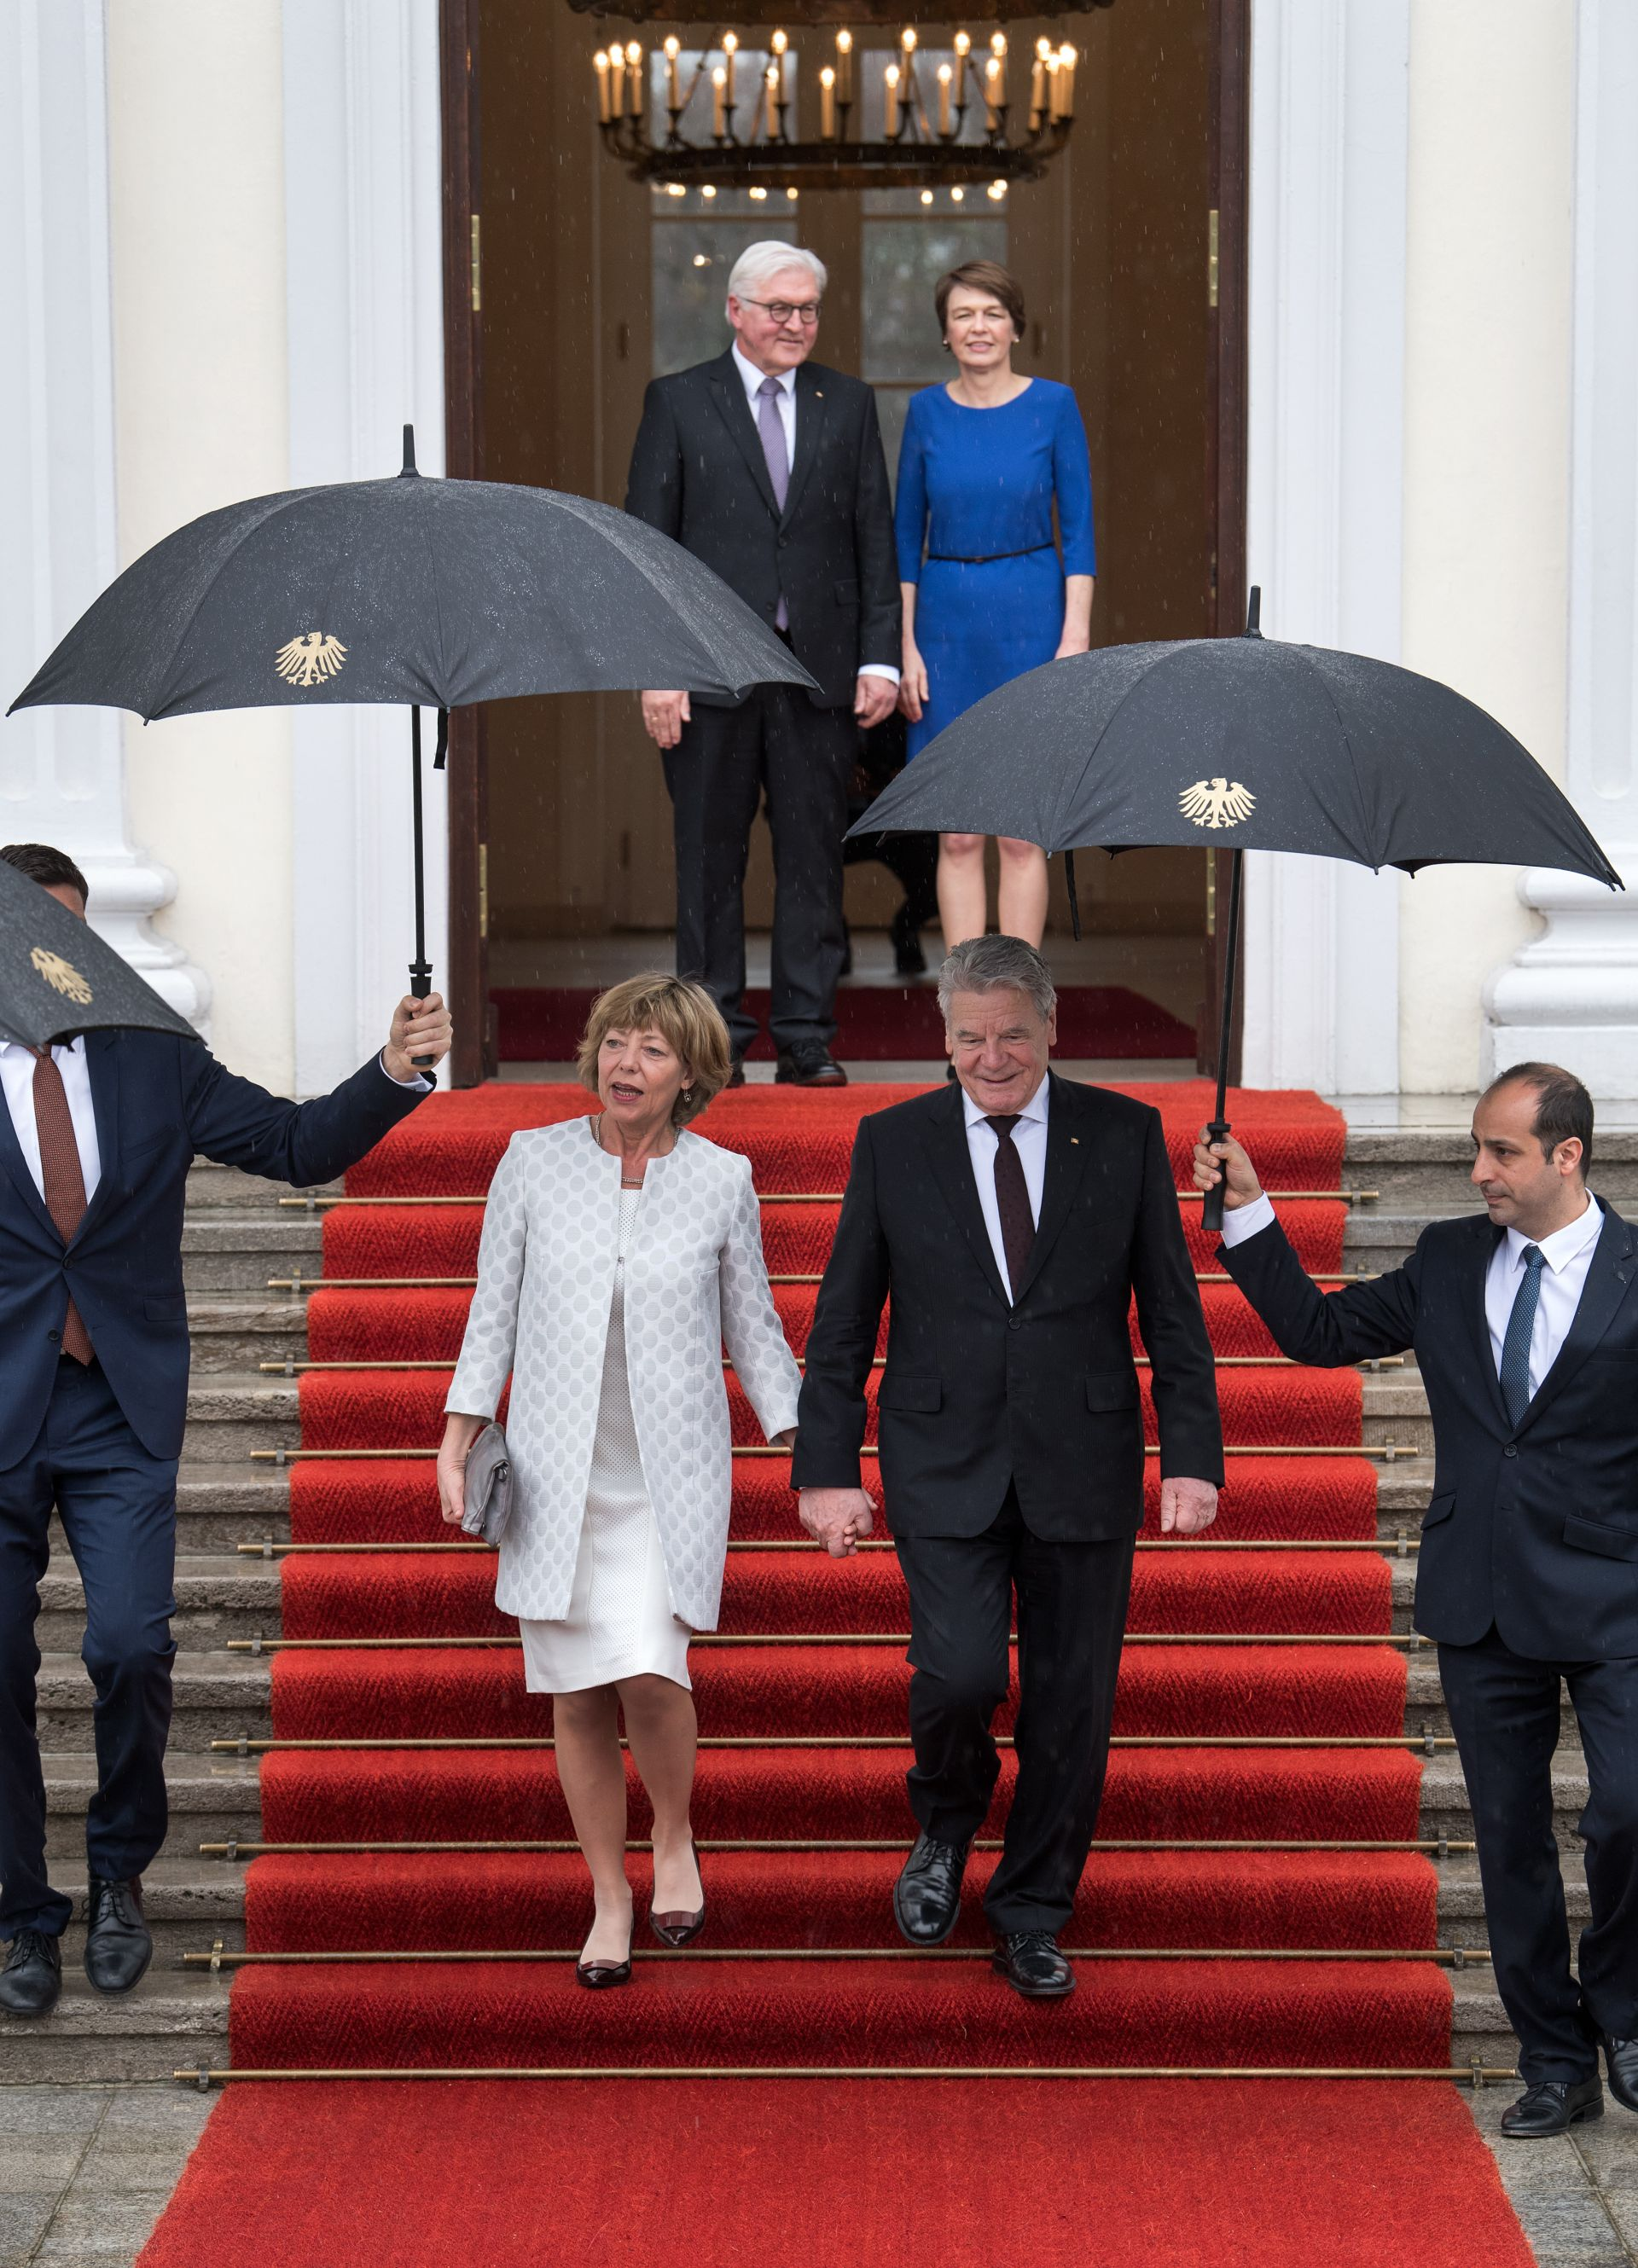 NJEMAČKA Gauck simbolično predao vlast Steinmeieru